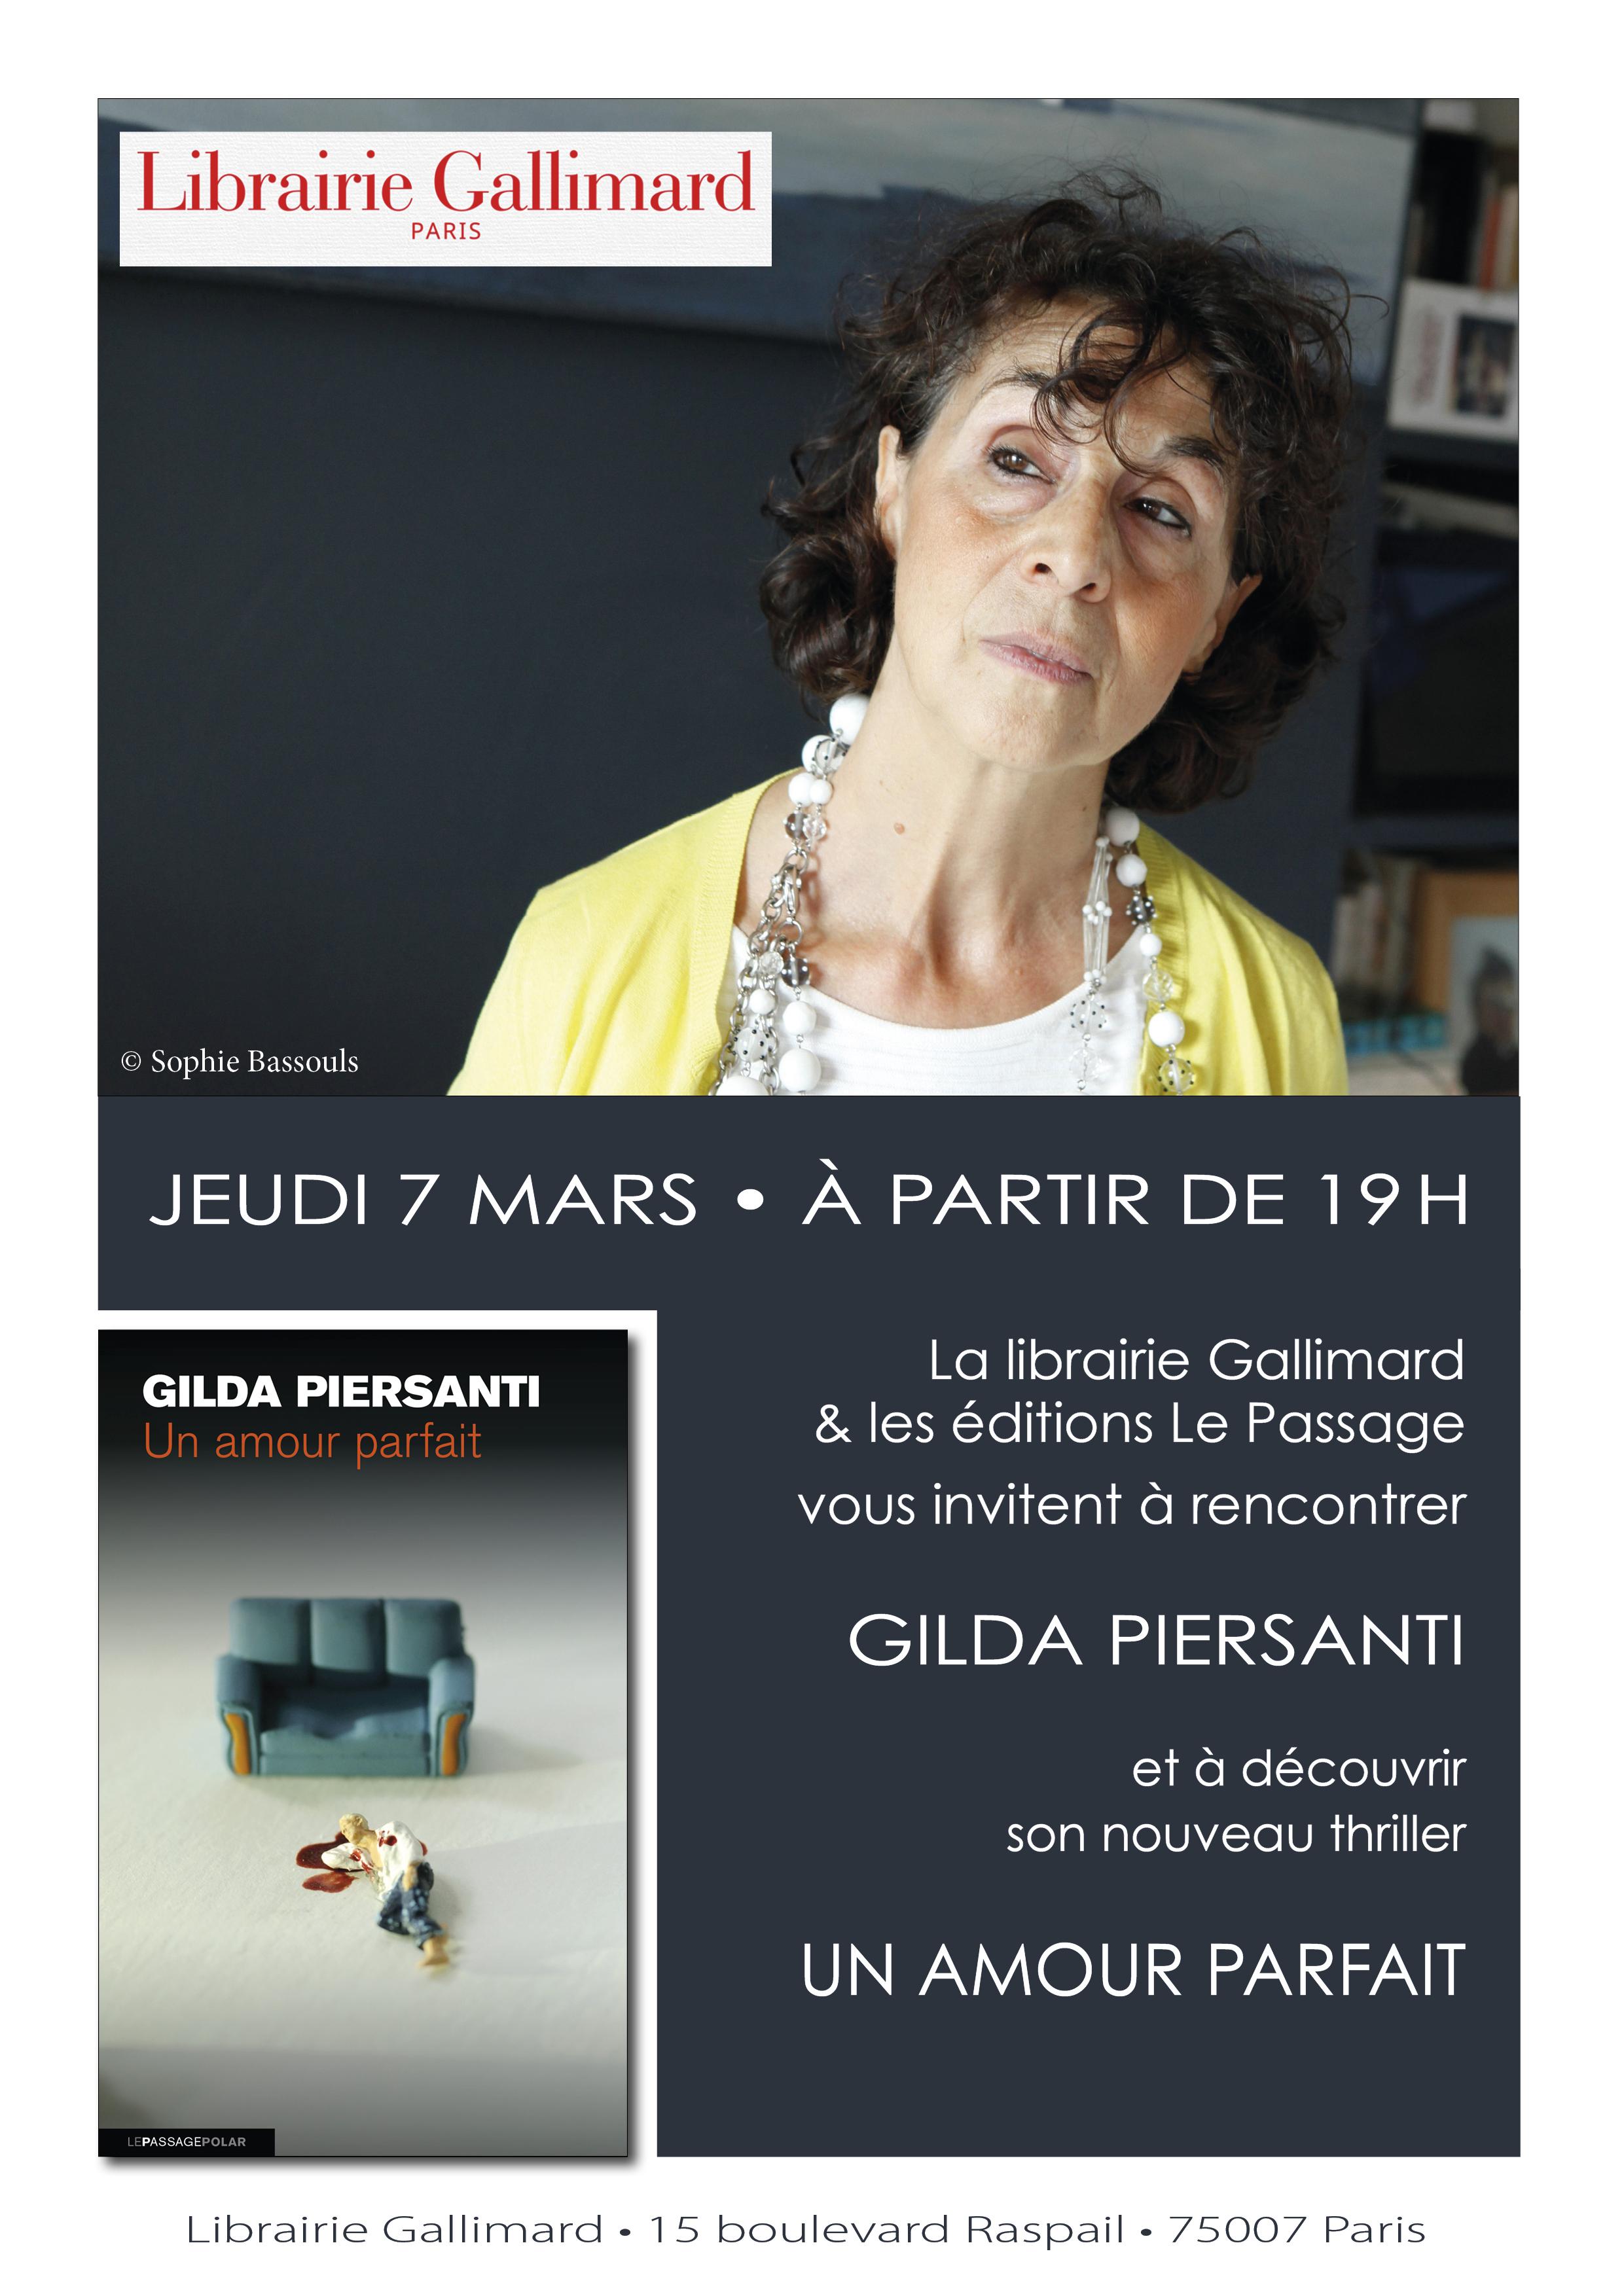 Affichette A4 GP Lib Gallimard